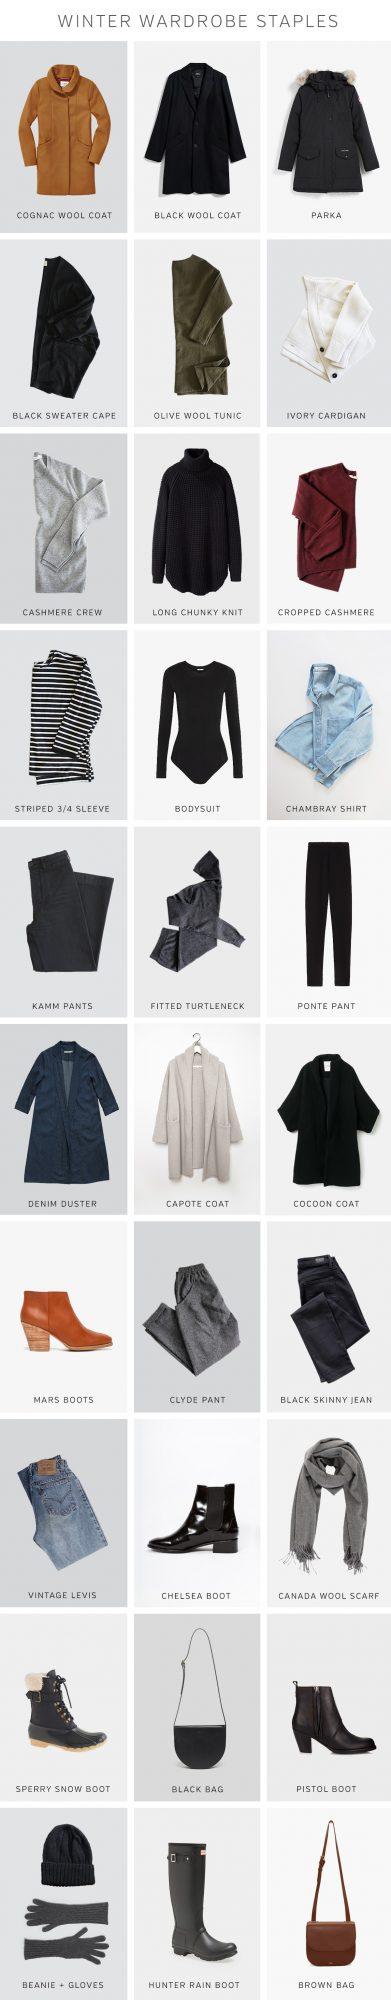 Style Bee - Winter Closet Assessment